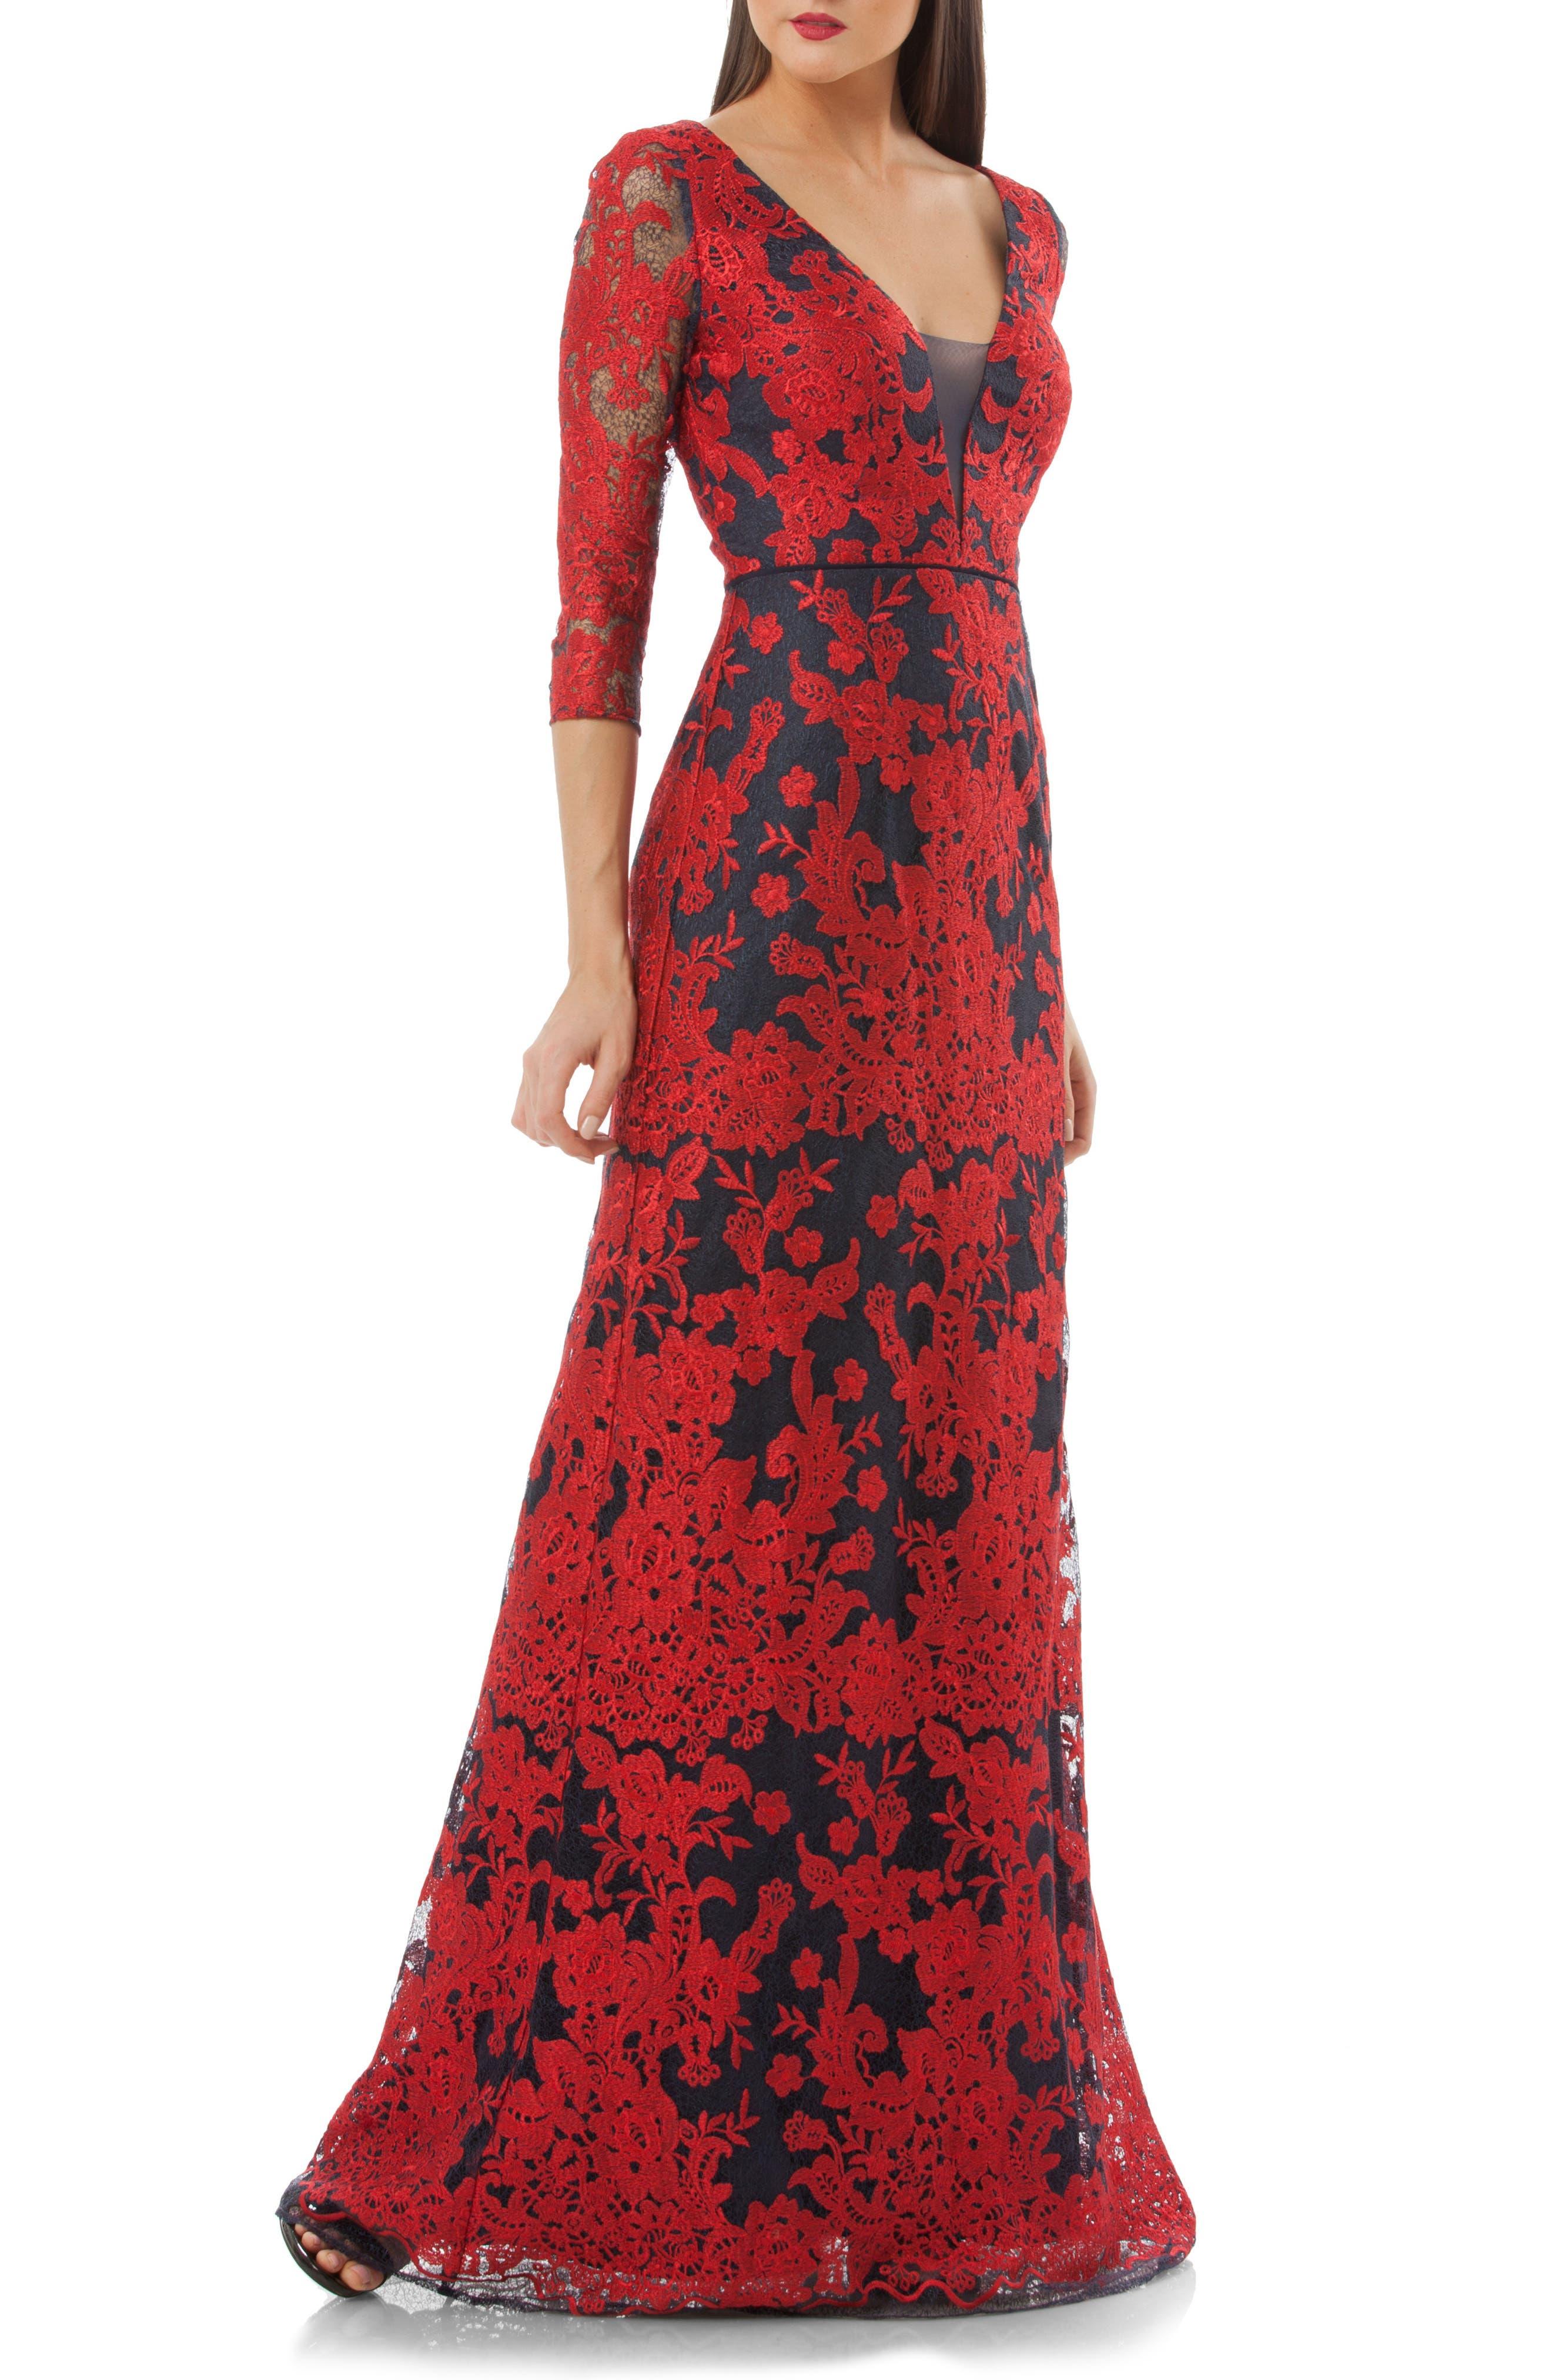 Nylon Dress